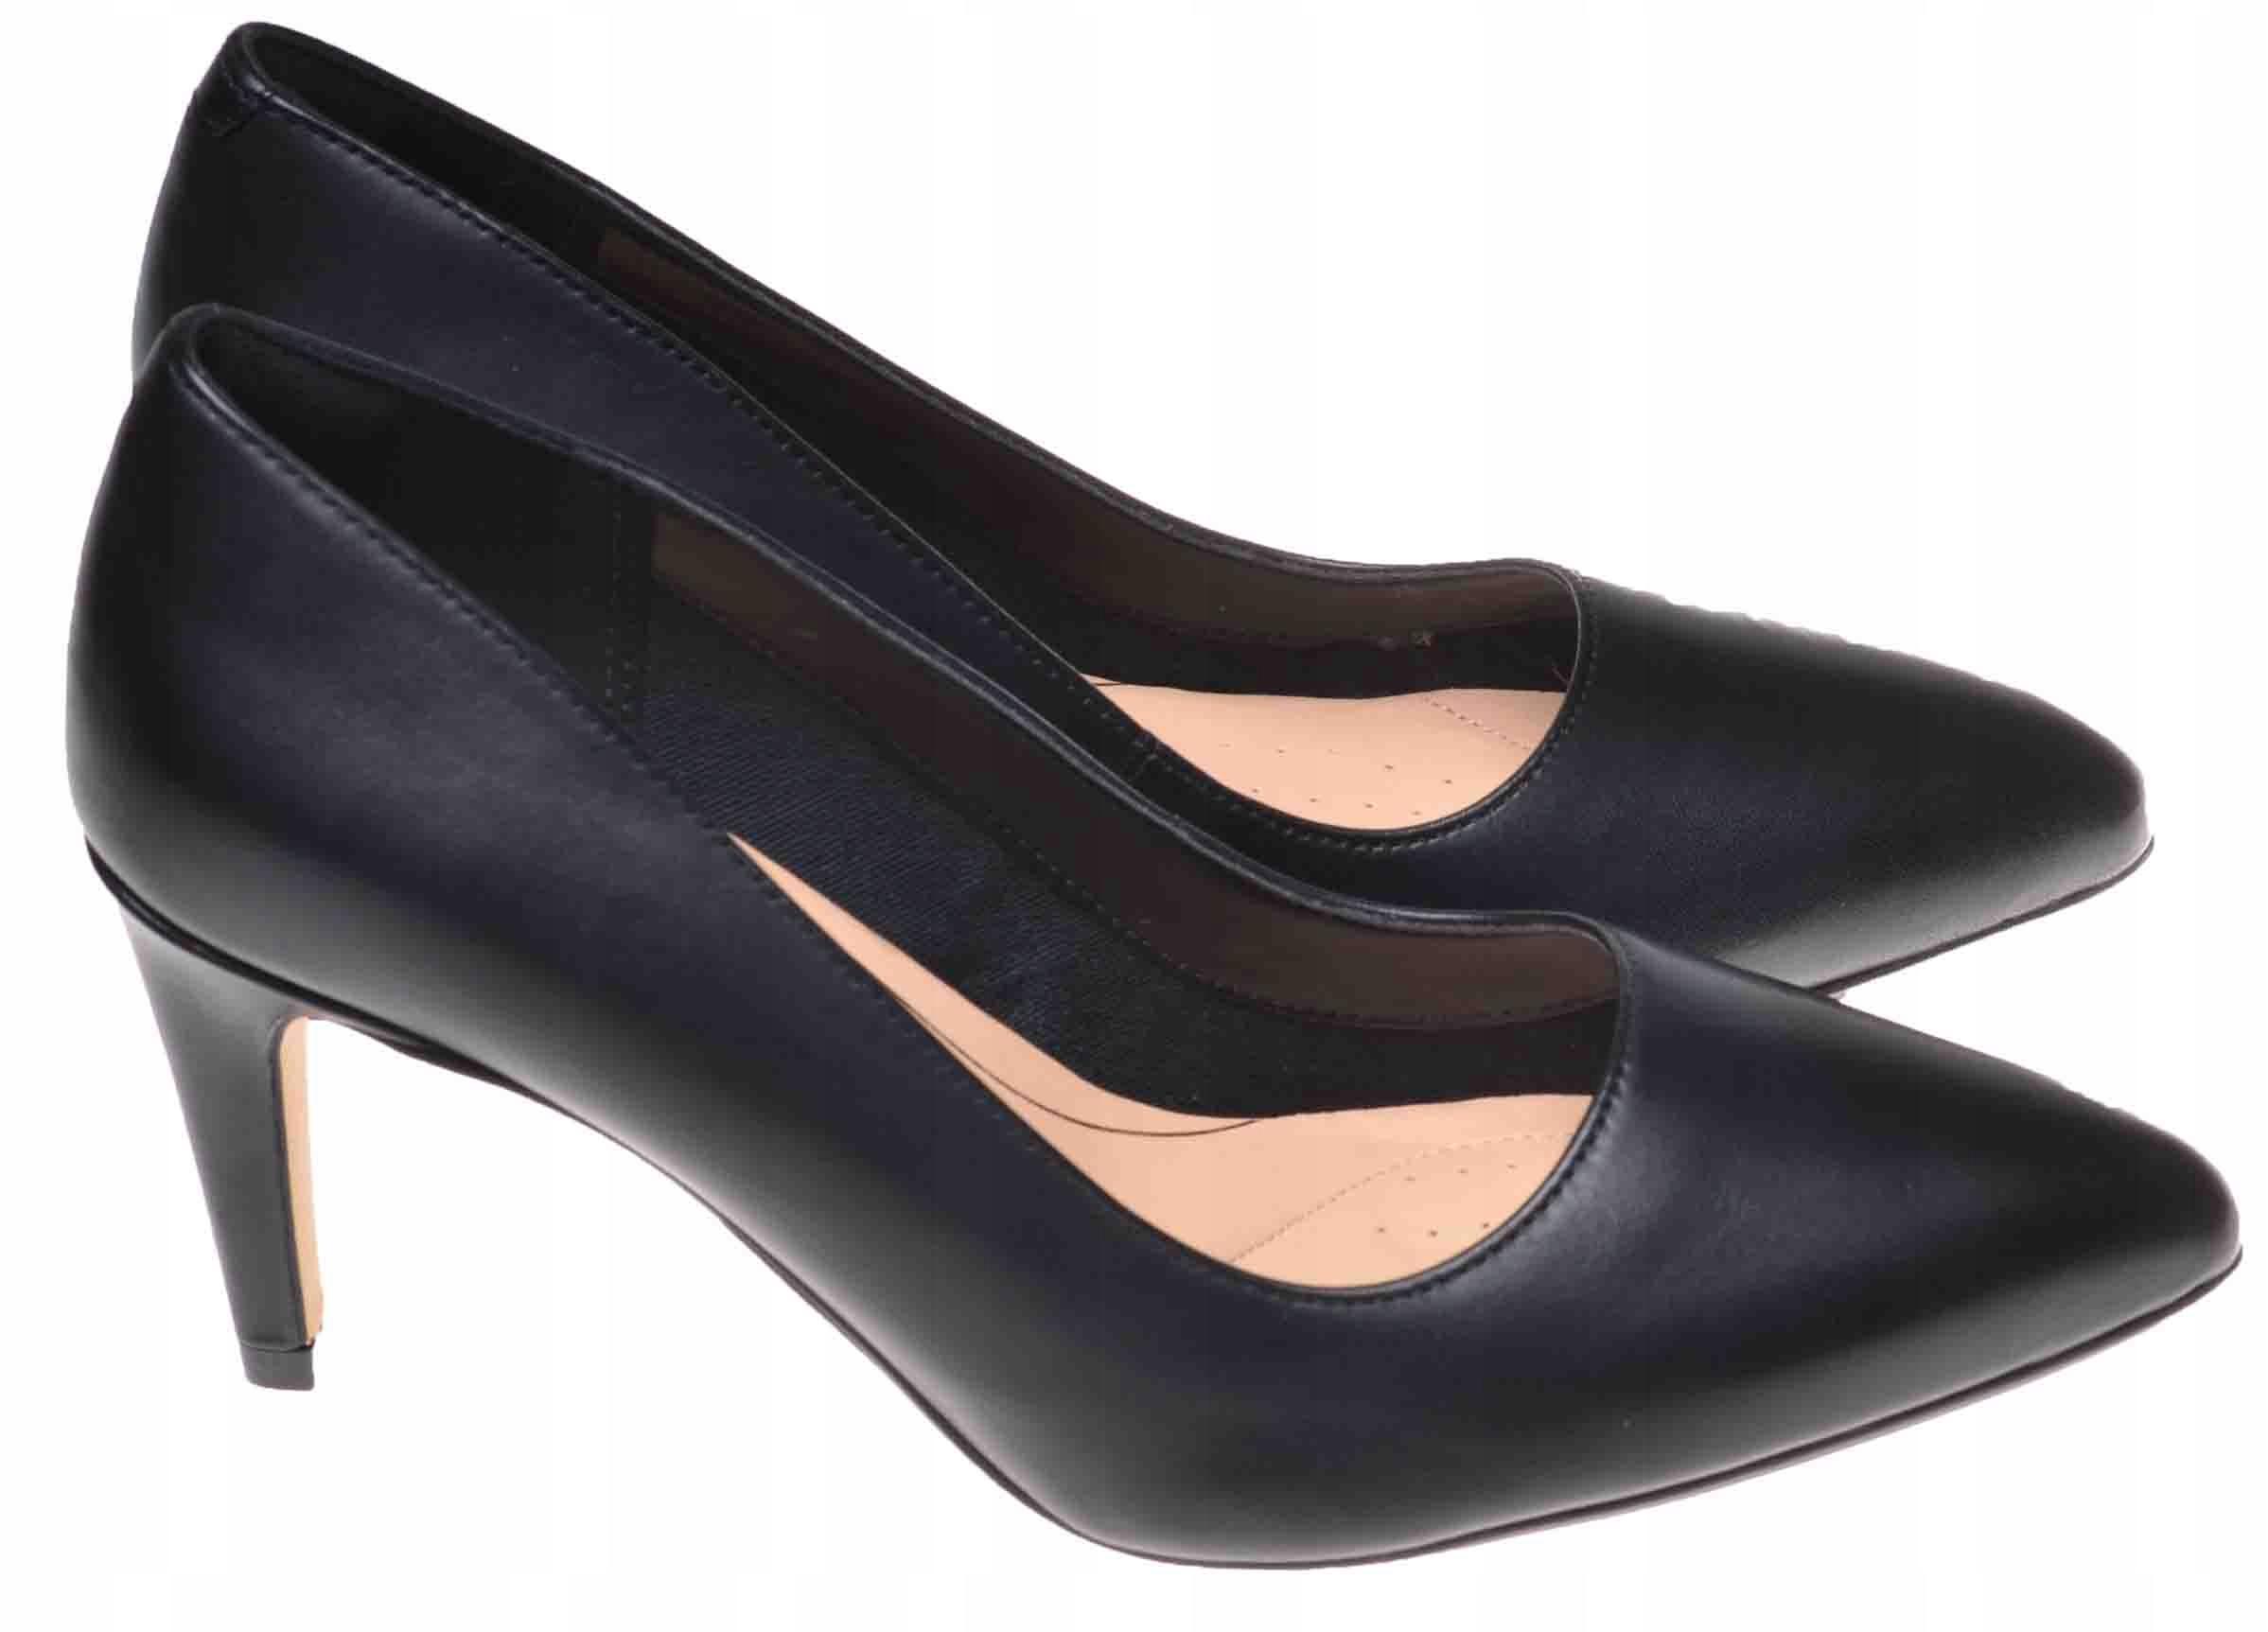 SZPILKI SZPIC CLARKS LAINA REA Black Leather 39,5